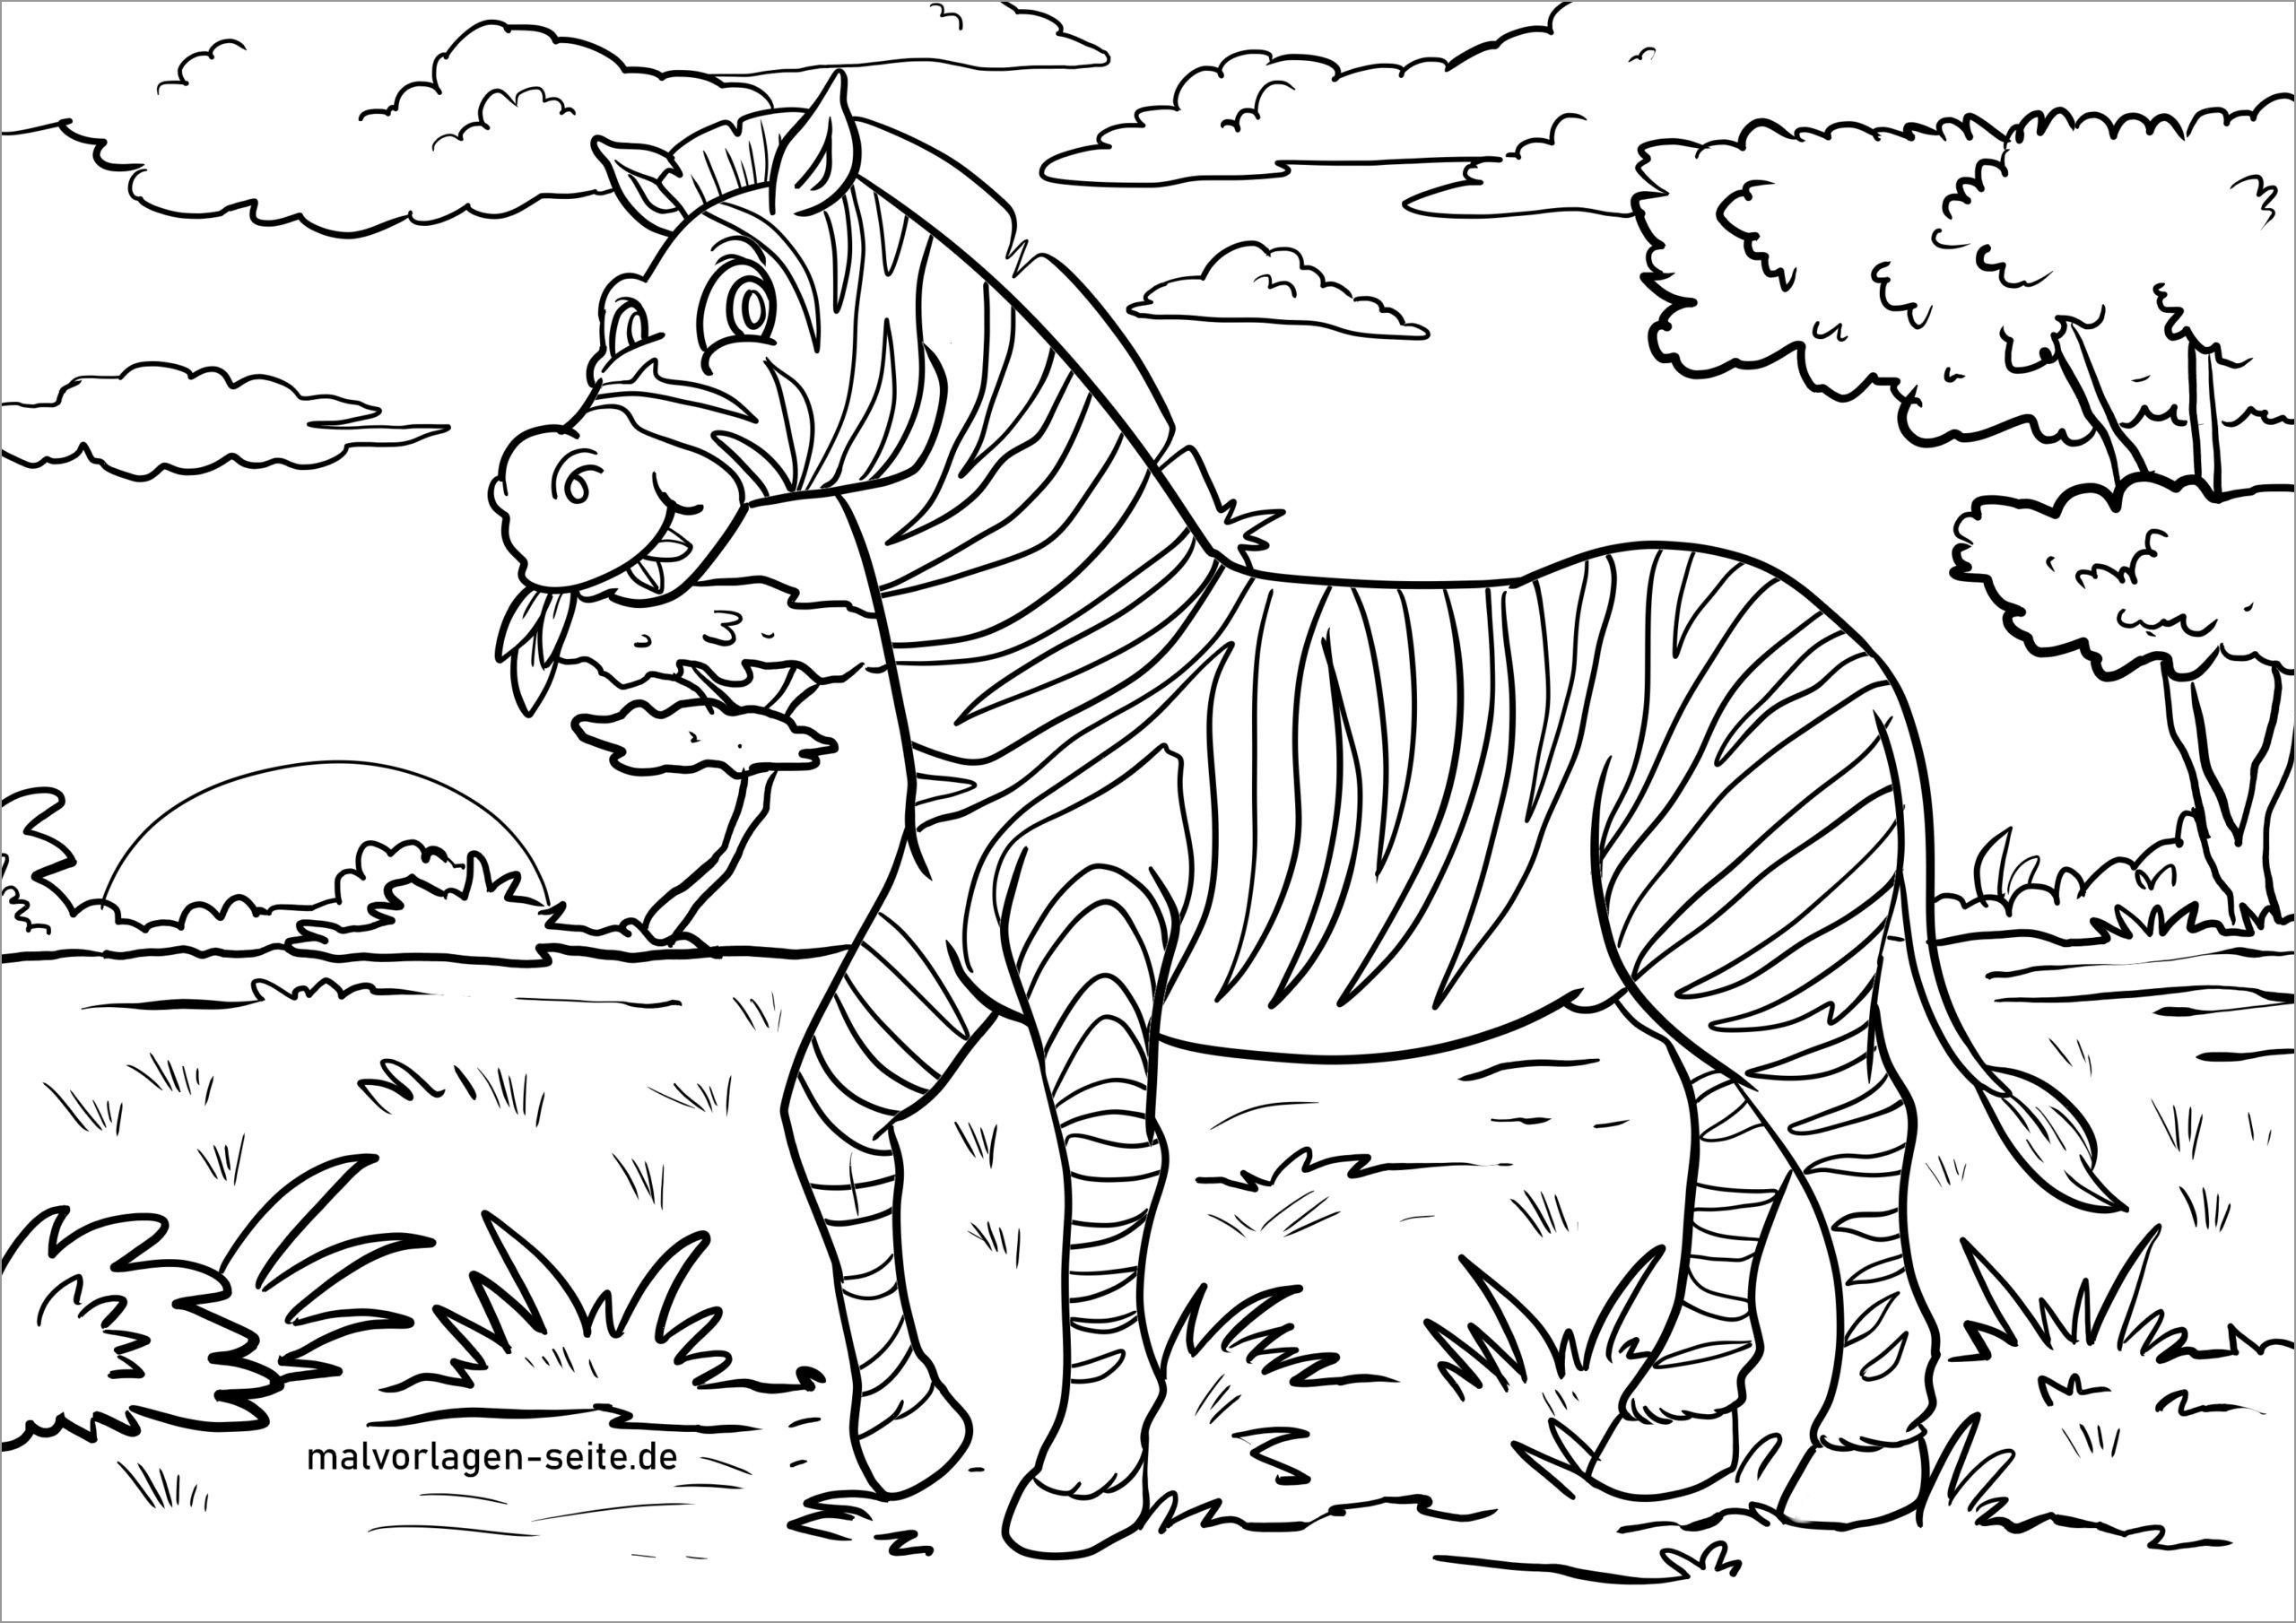 Ausmalbild Zebra Coloring Page